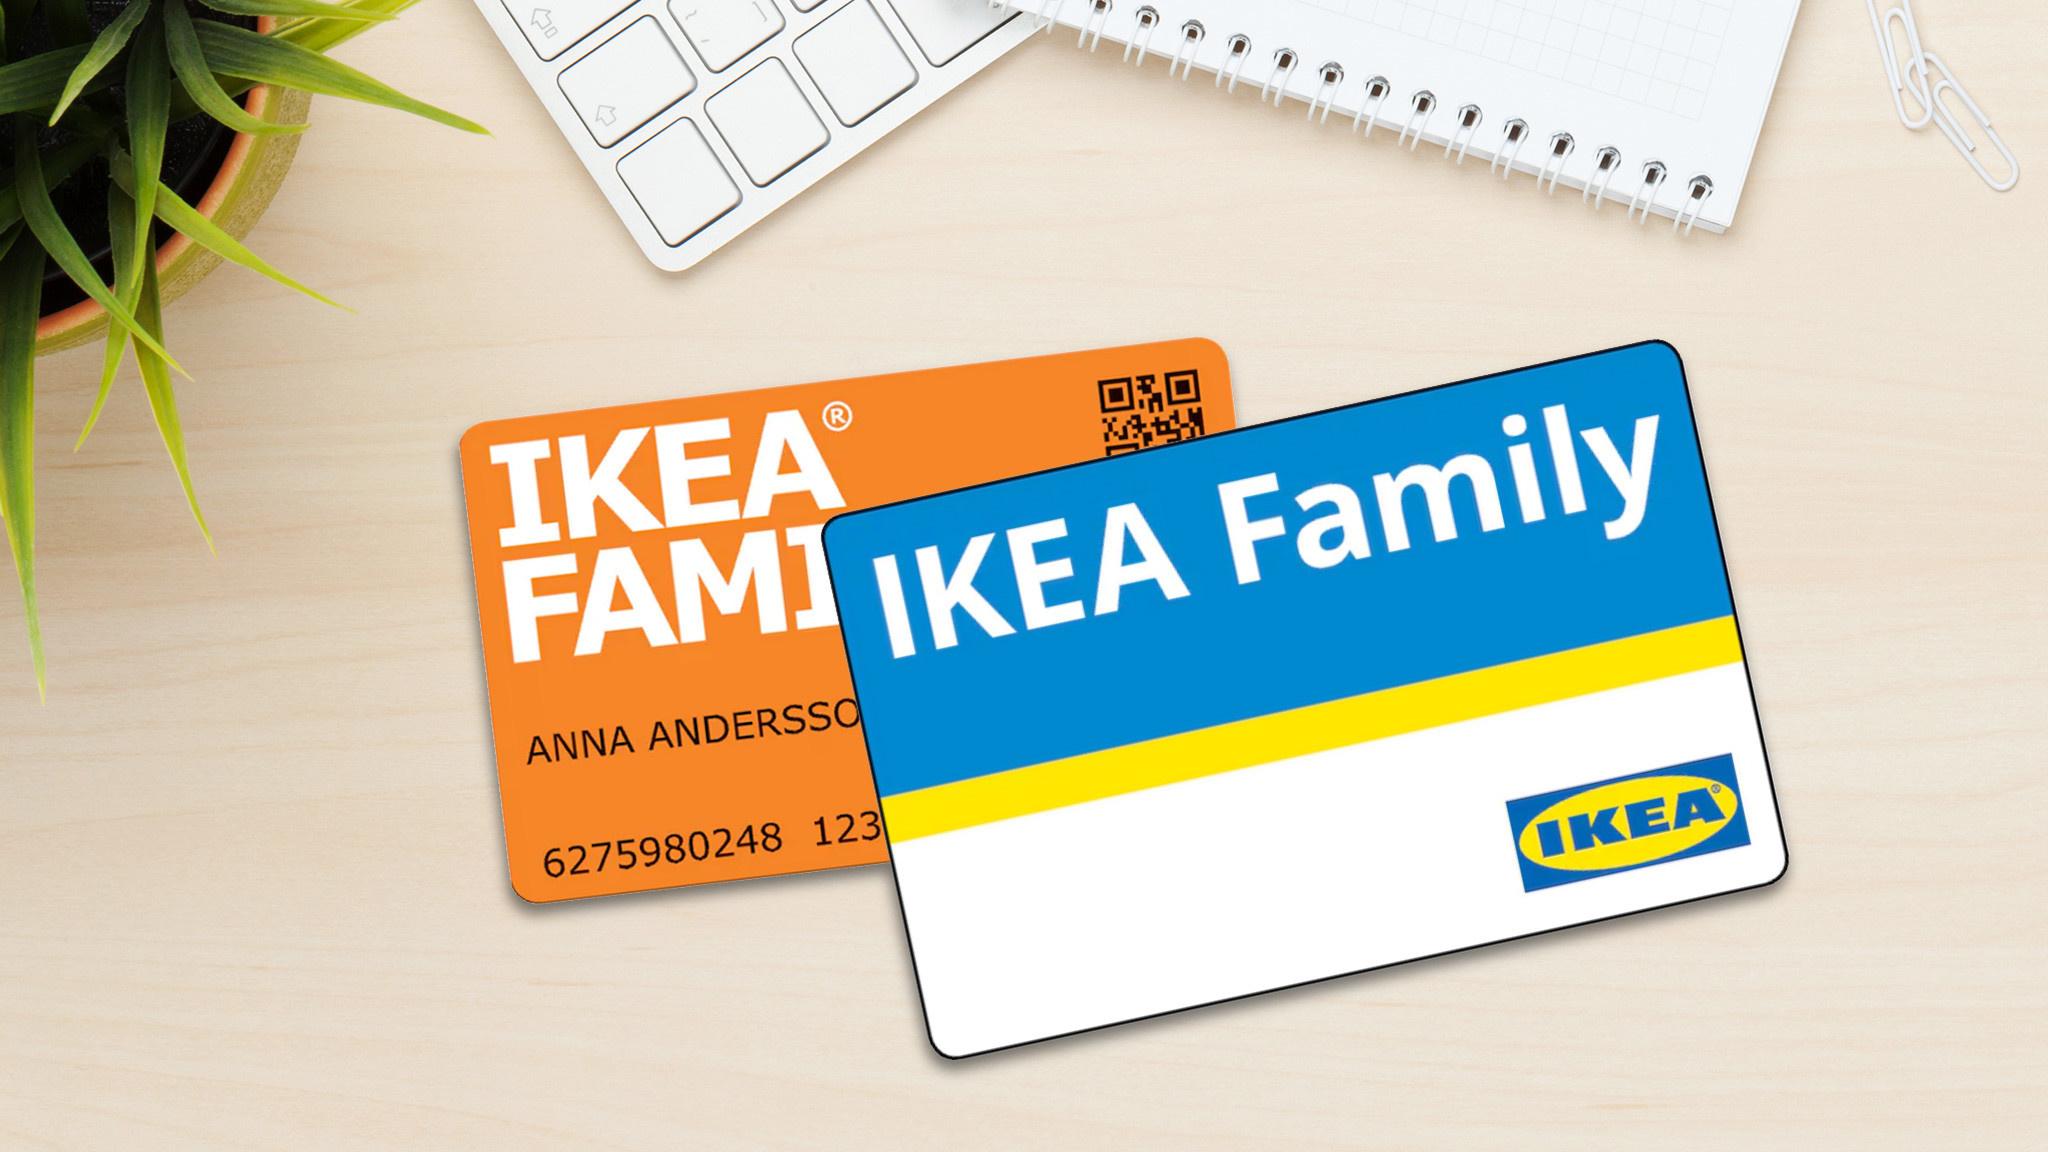 Apple Wallet Die Ikea Family Karte Aufs Iphone Computer Bild